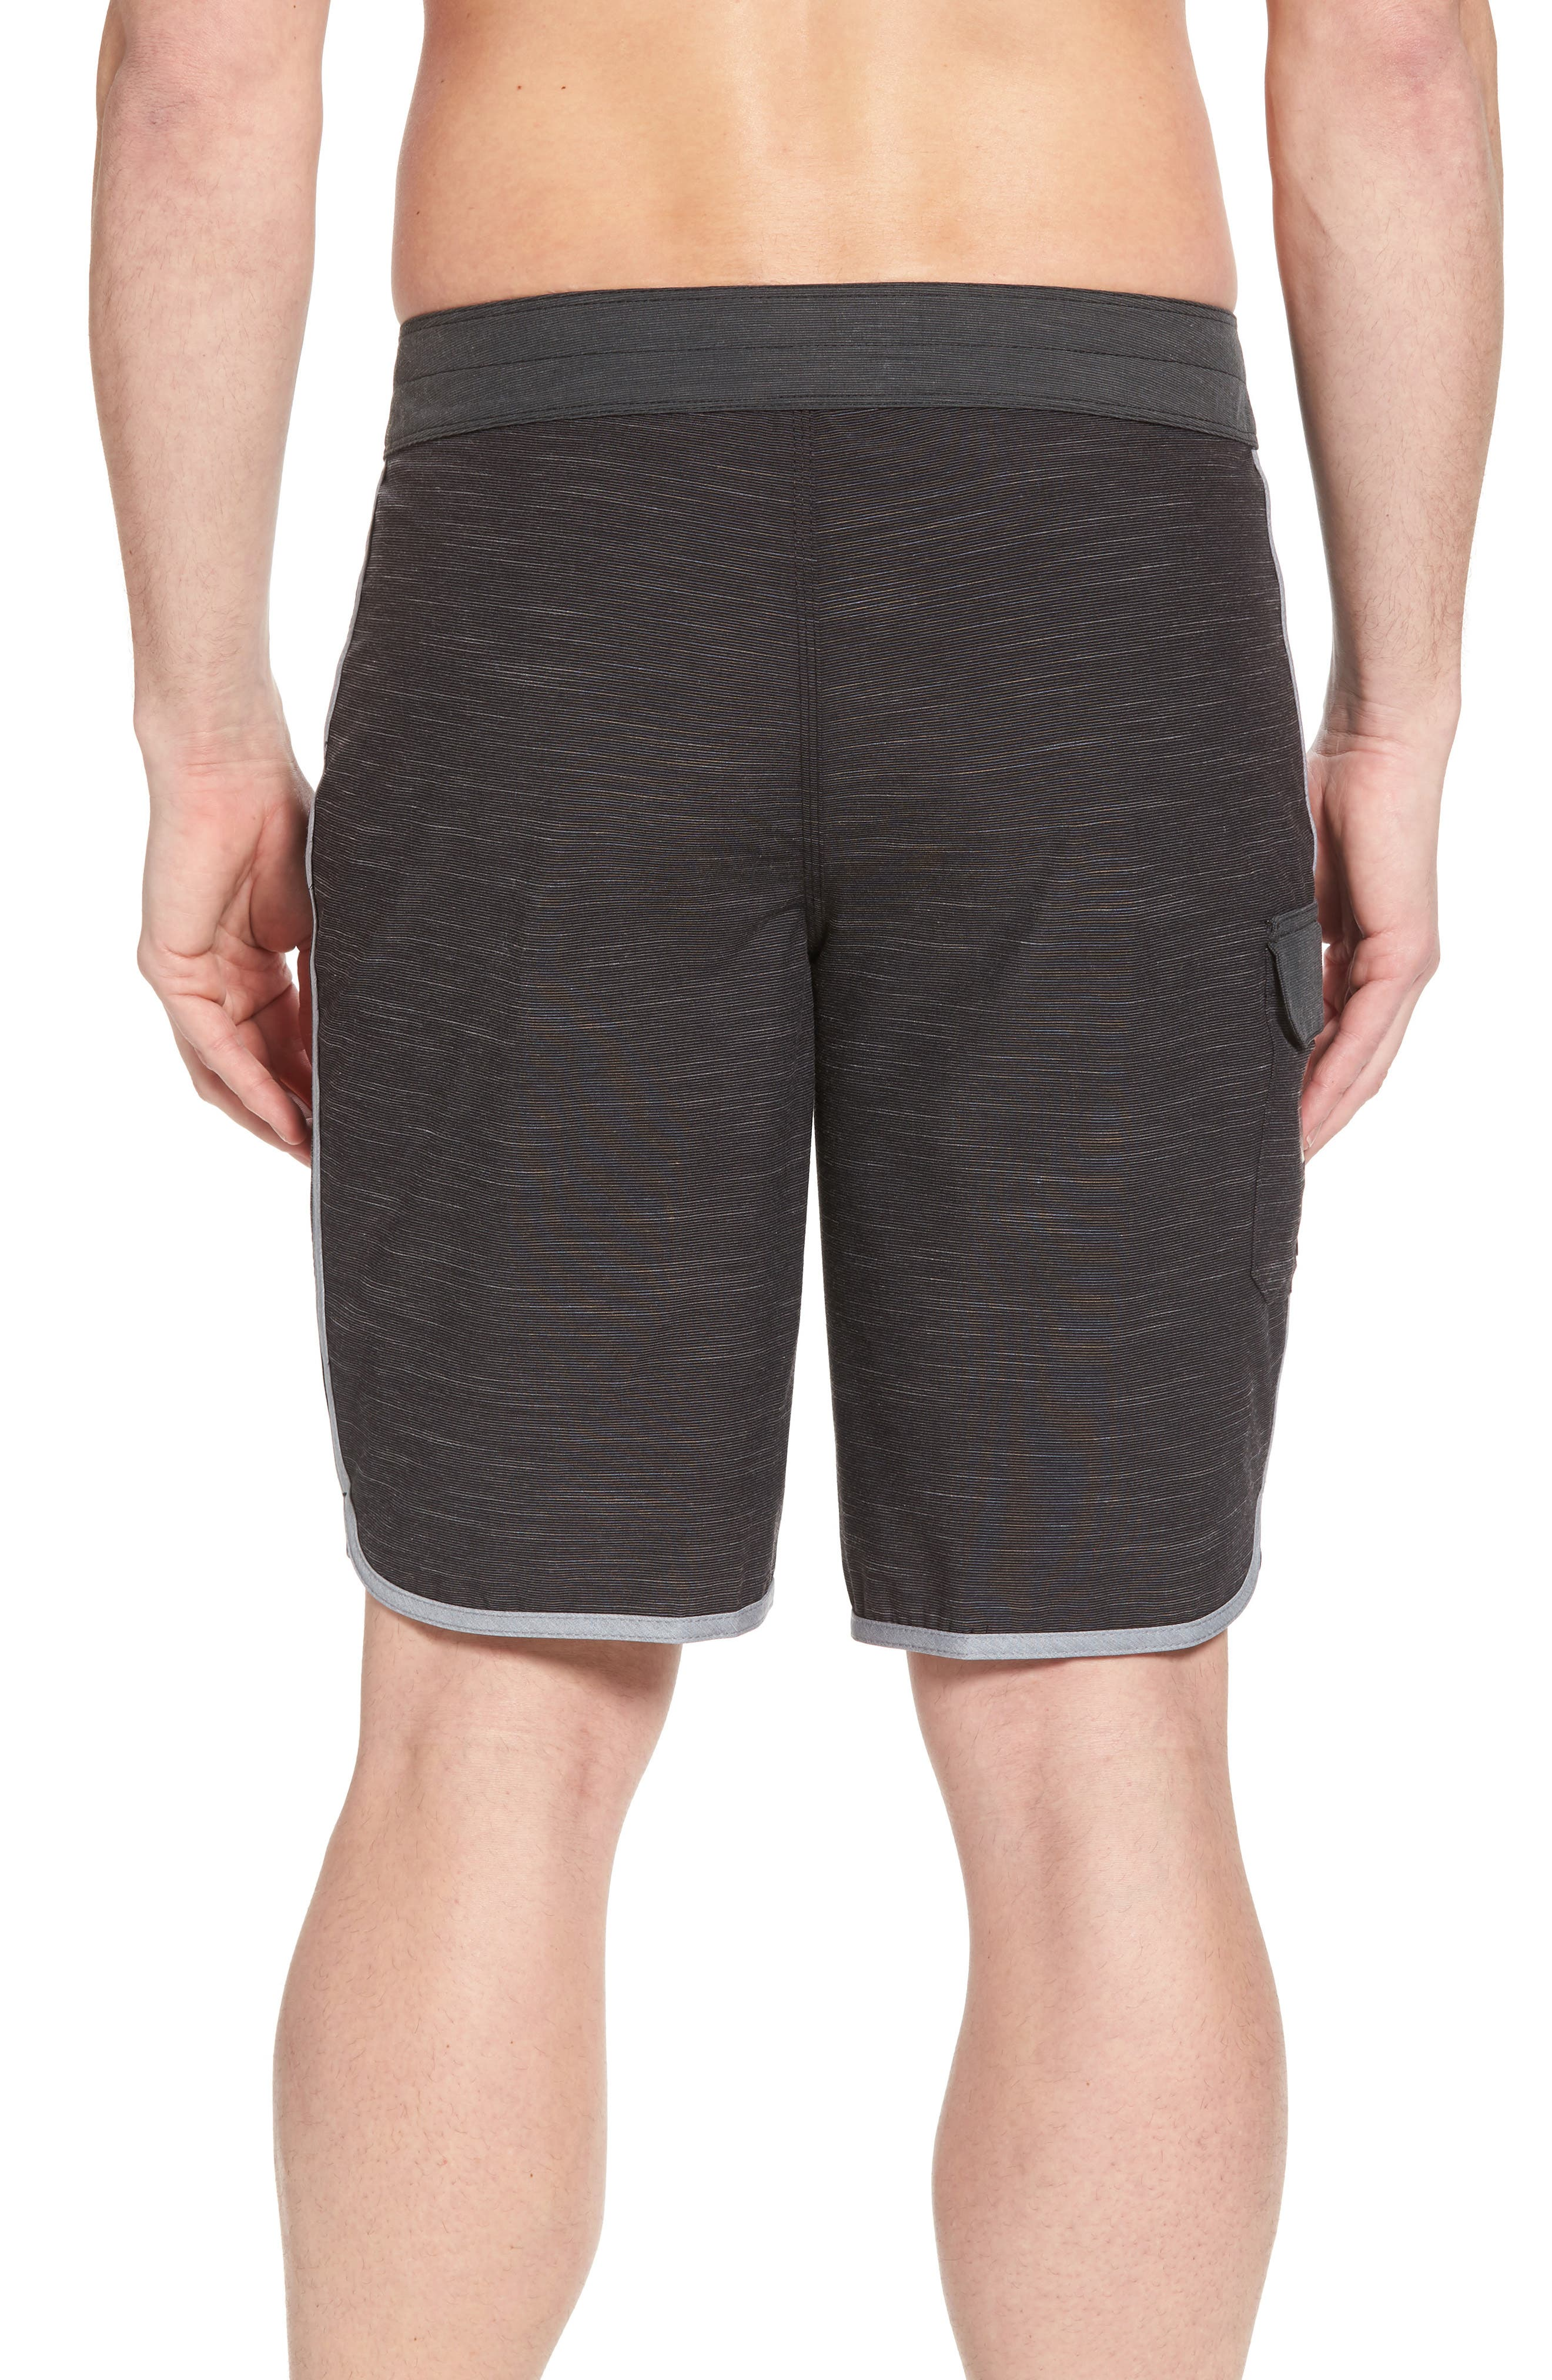 73 X Short Board Shorts,                             Alternate thumbnail 2, color,                             001